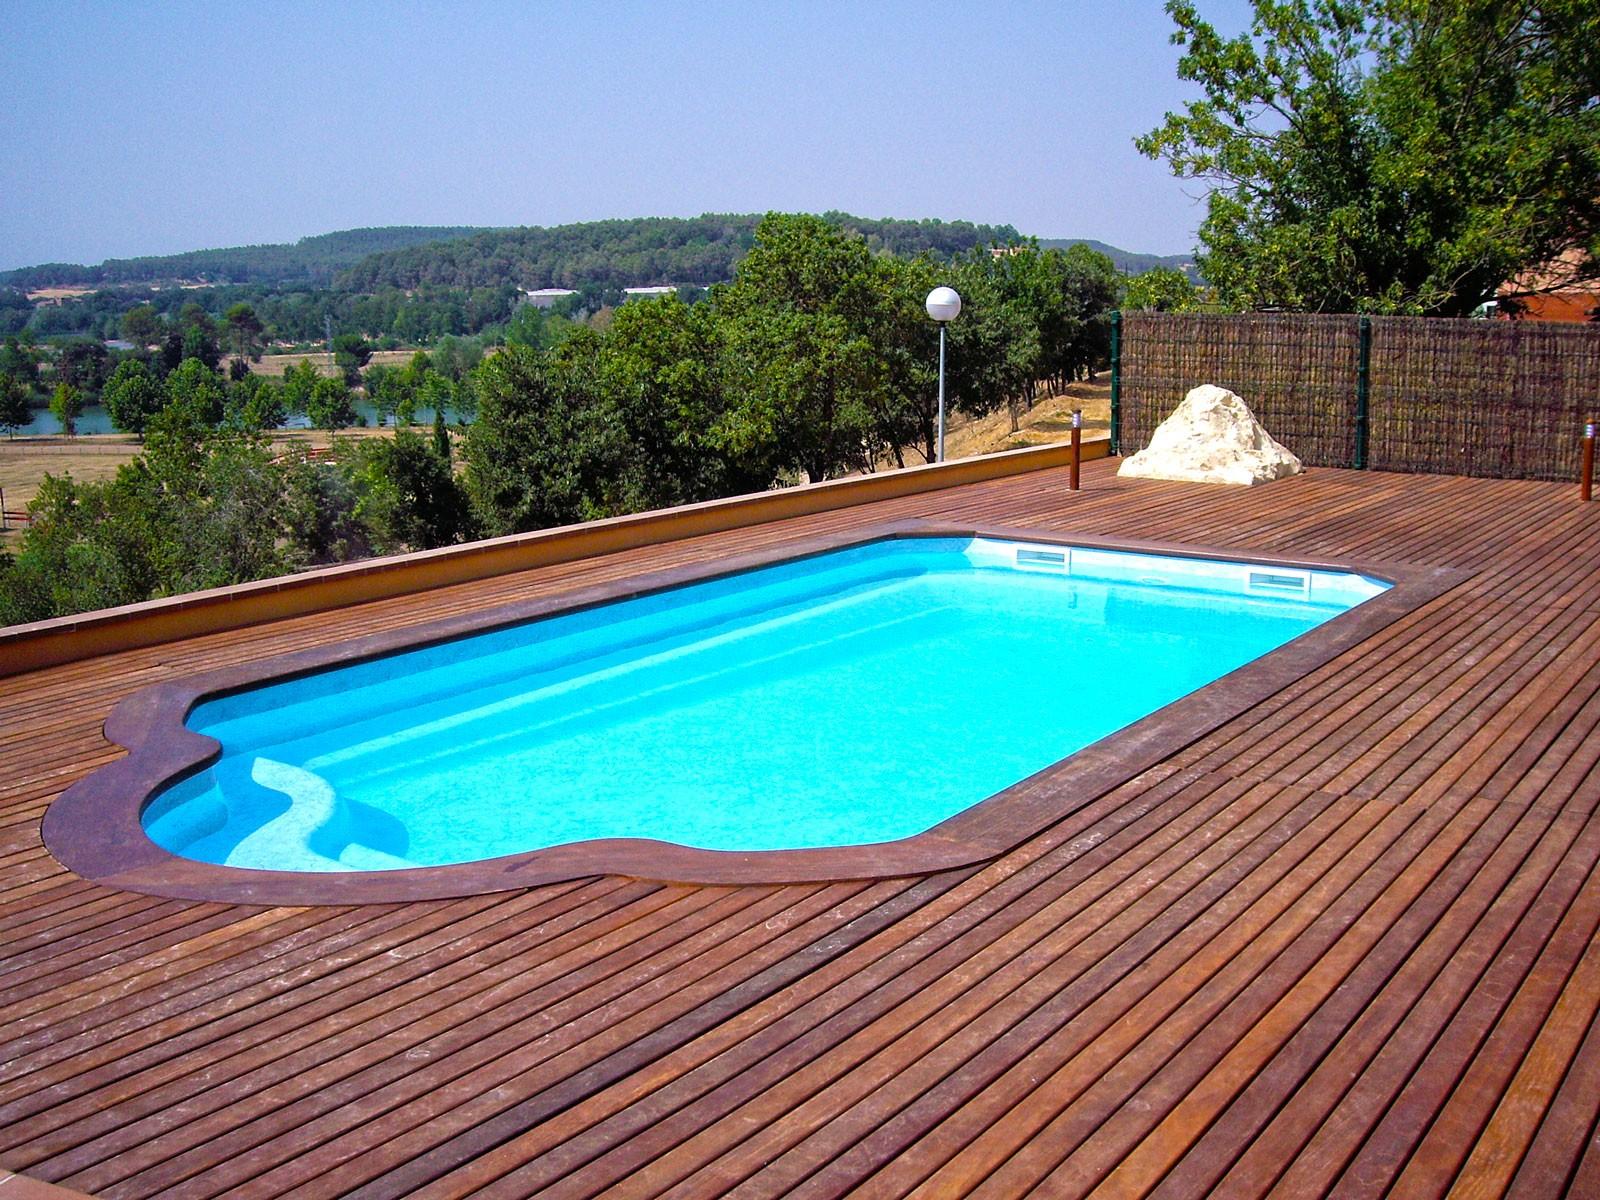 piscina de fibra polister jan - Piscinas De Fibra